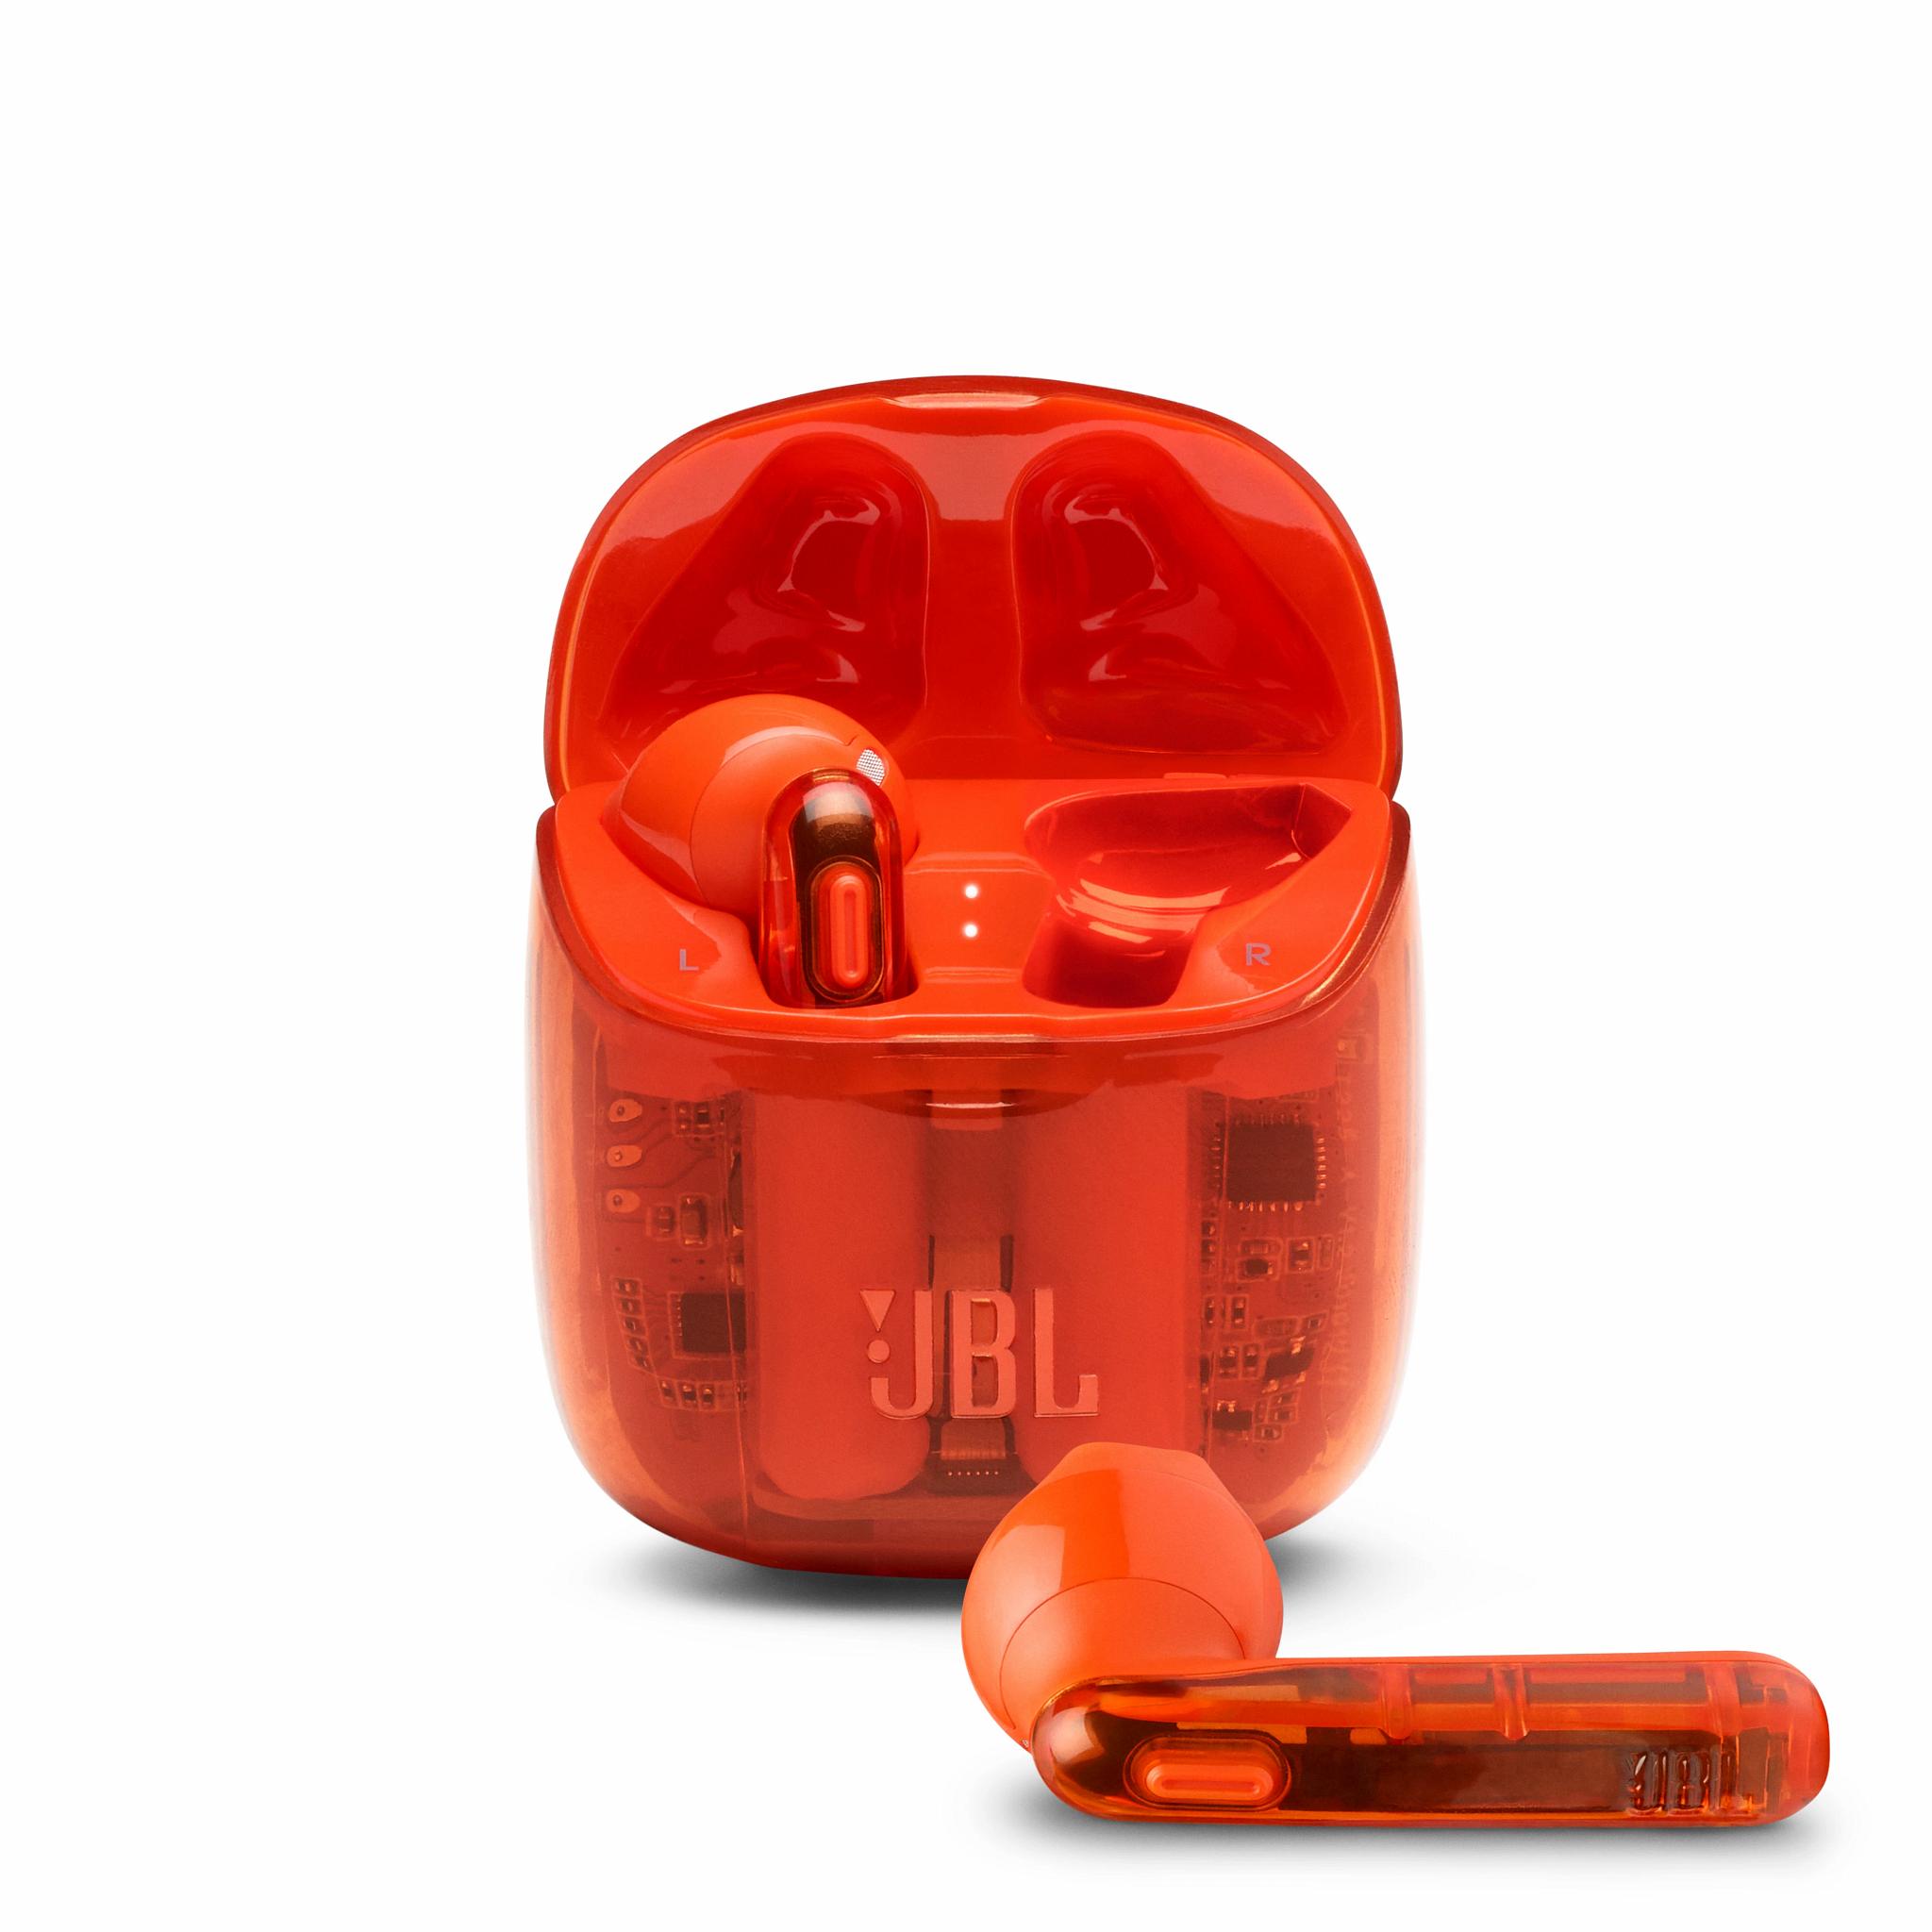 369096 368953 jbl tune%20225tws%20ghost product%20image hero orange 0cfb8d original 1603725047 f061ad original 1603892147